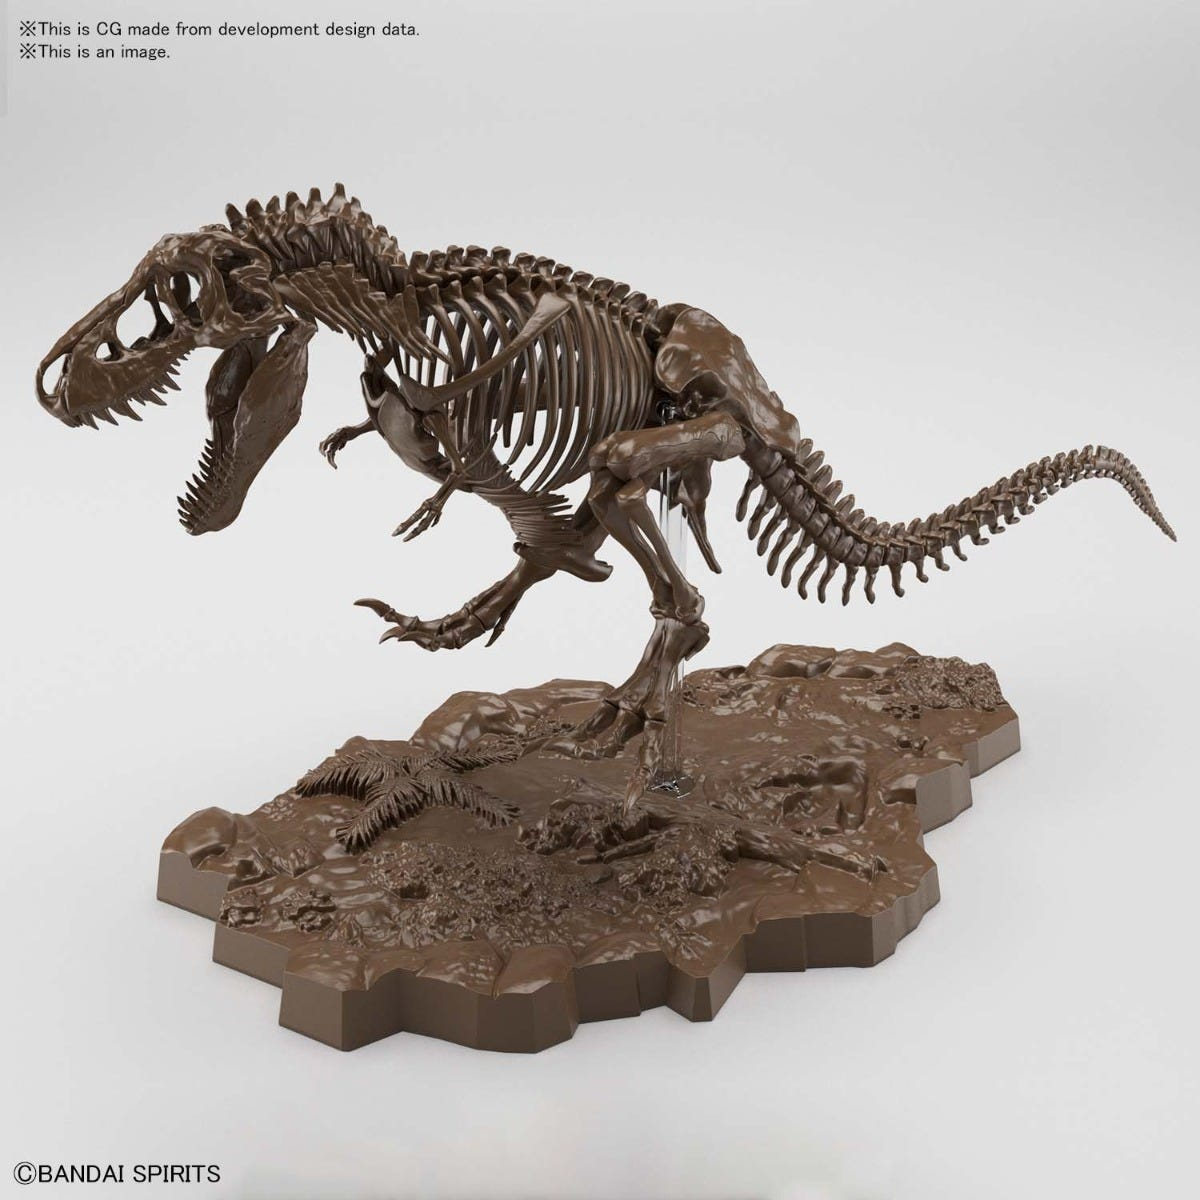 Bandai Spirits 1/32 Hobby Imaginary Skeleton Tyranosaurus, Model Kit